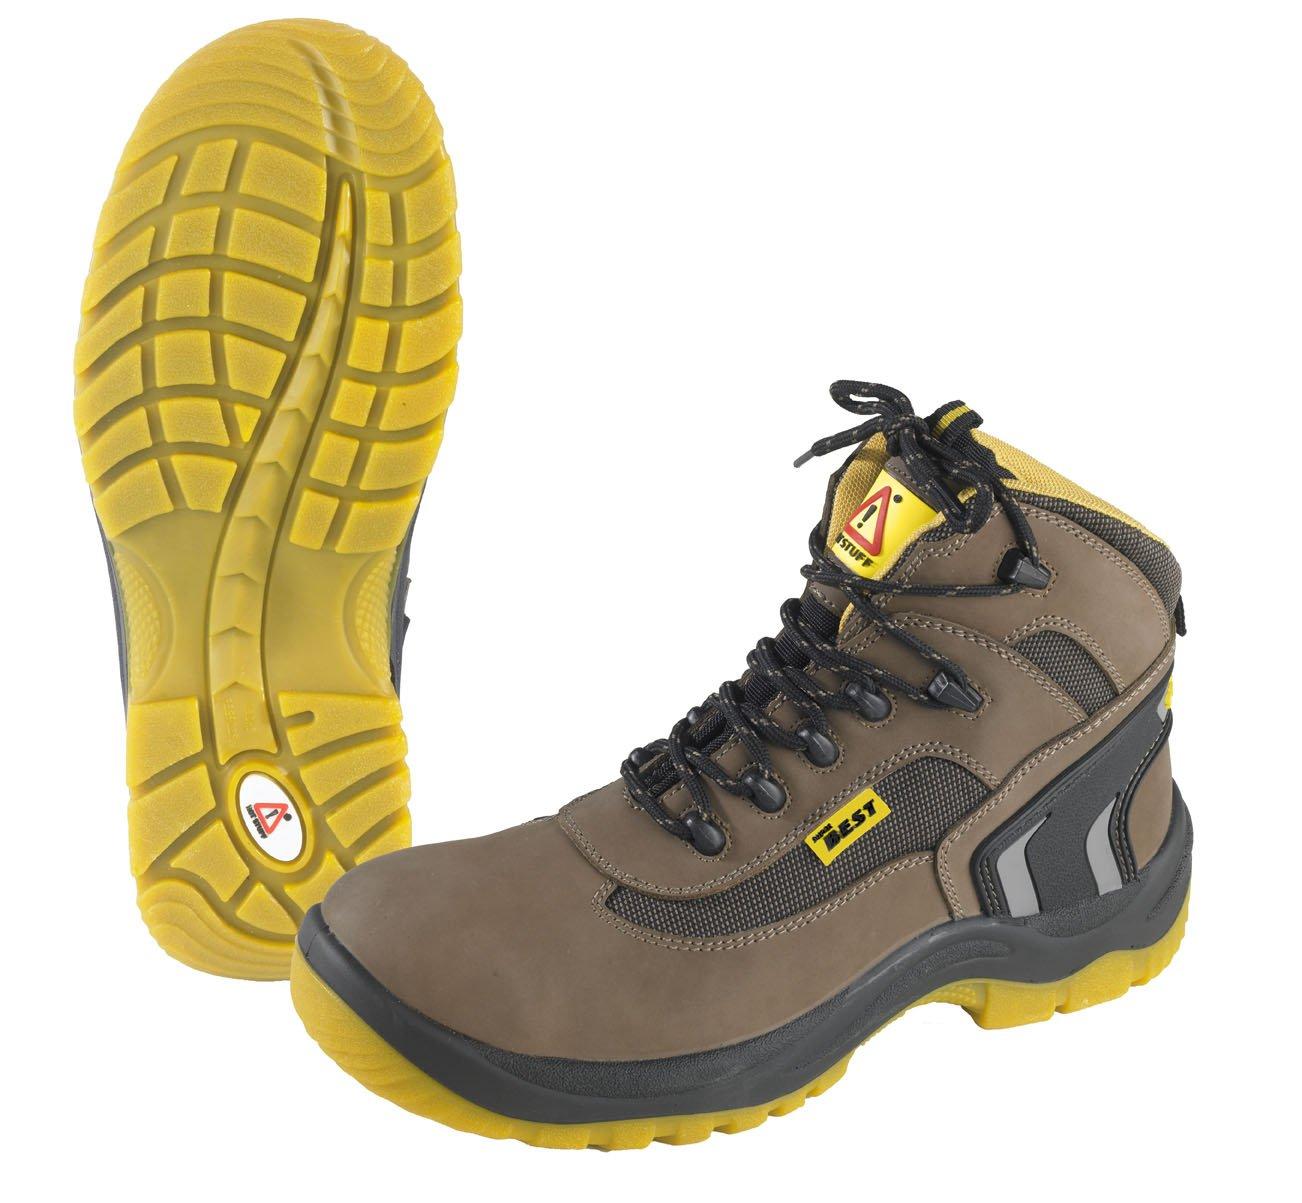 Seba 695 41 EG Schuh hohe, braun S3, Gr. 41 695 - 983d20